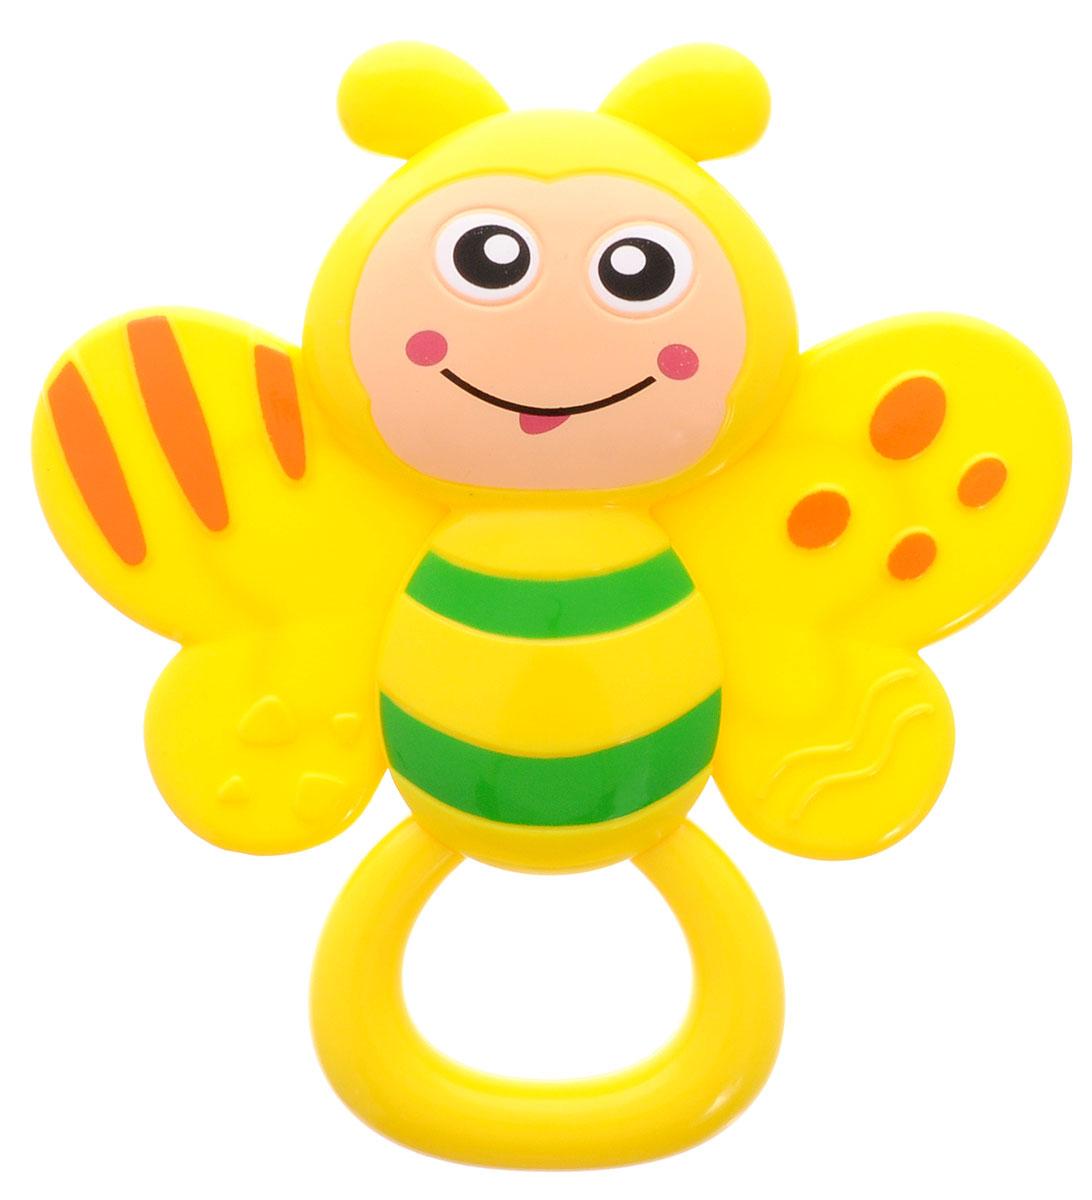 шампуни l oreal paris ламинирующий шампунь уход elseve эксперт цвета 250 мл Умка Погремушка Бабочка цвет желтый